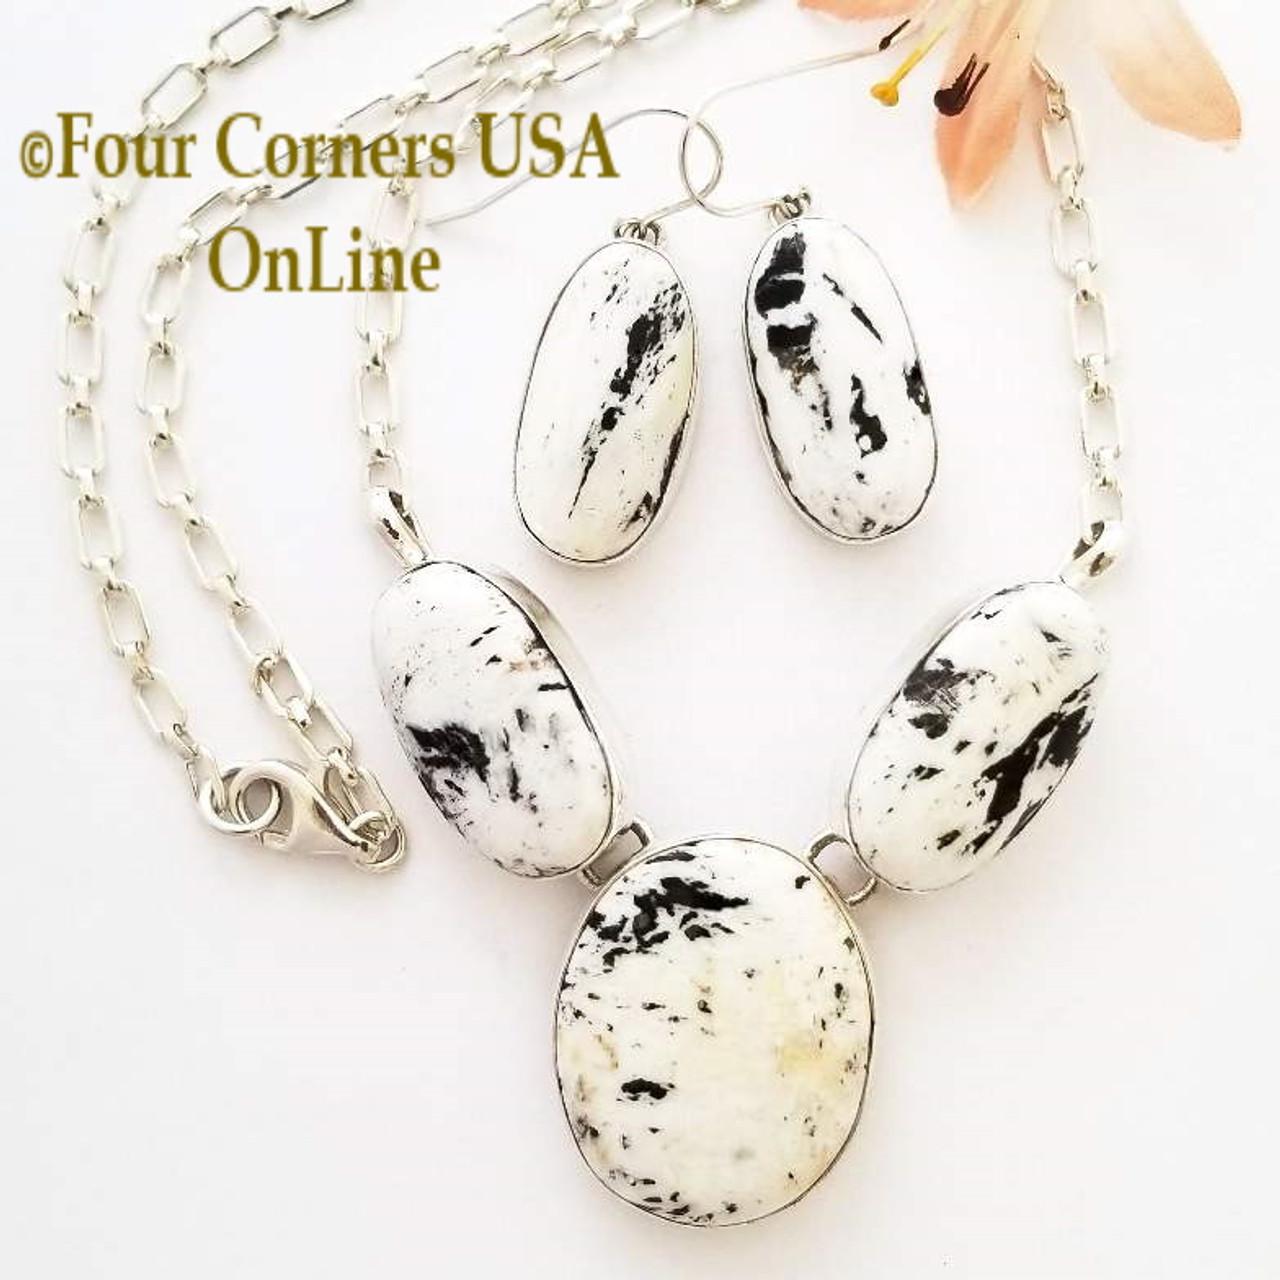 3 Stone White Buffalo Turquoise Necklace Earring Jewelry Set Navajo Lyle  Piaso NAN-1434 Special Buy Final Sale